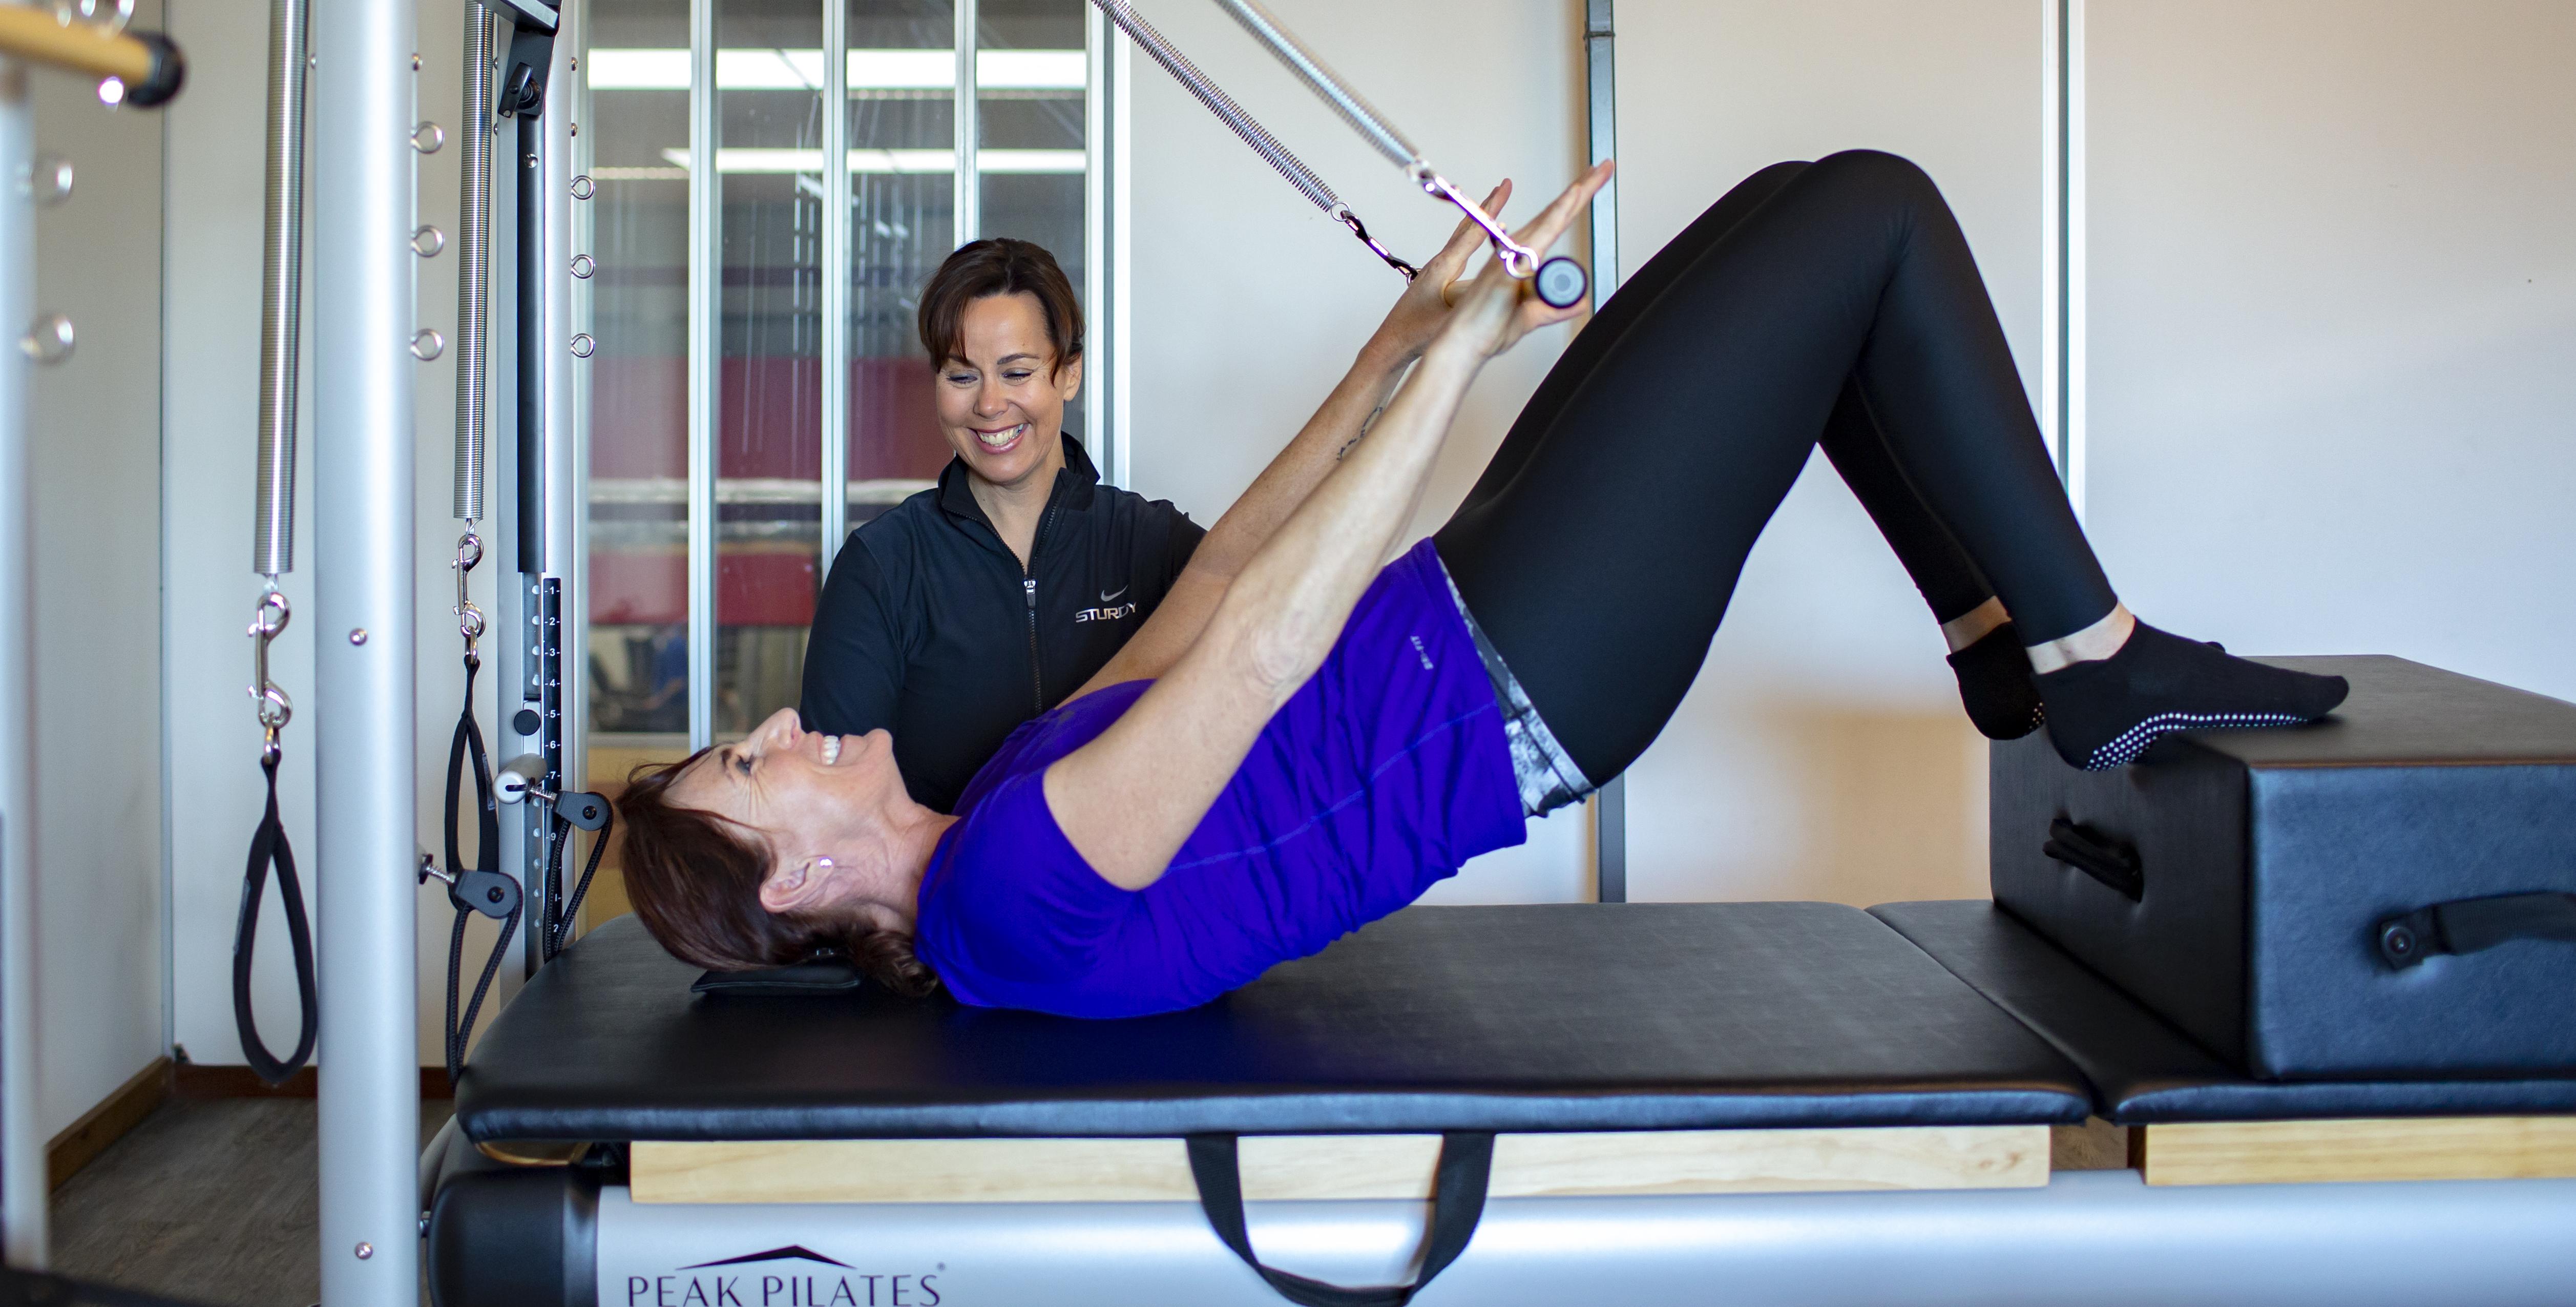 Personal Pilates Training Sturdy Oud Beijerland